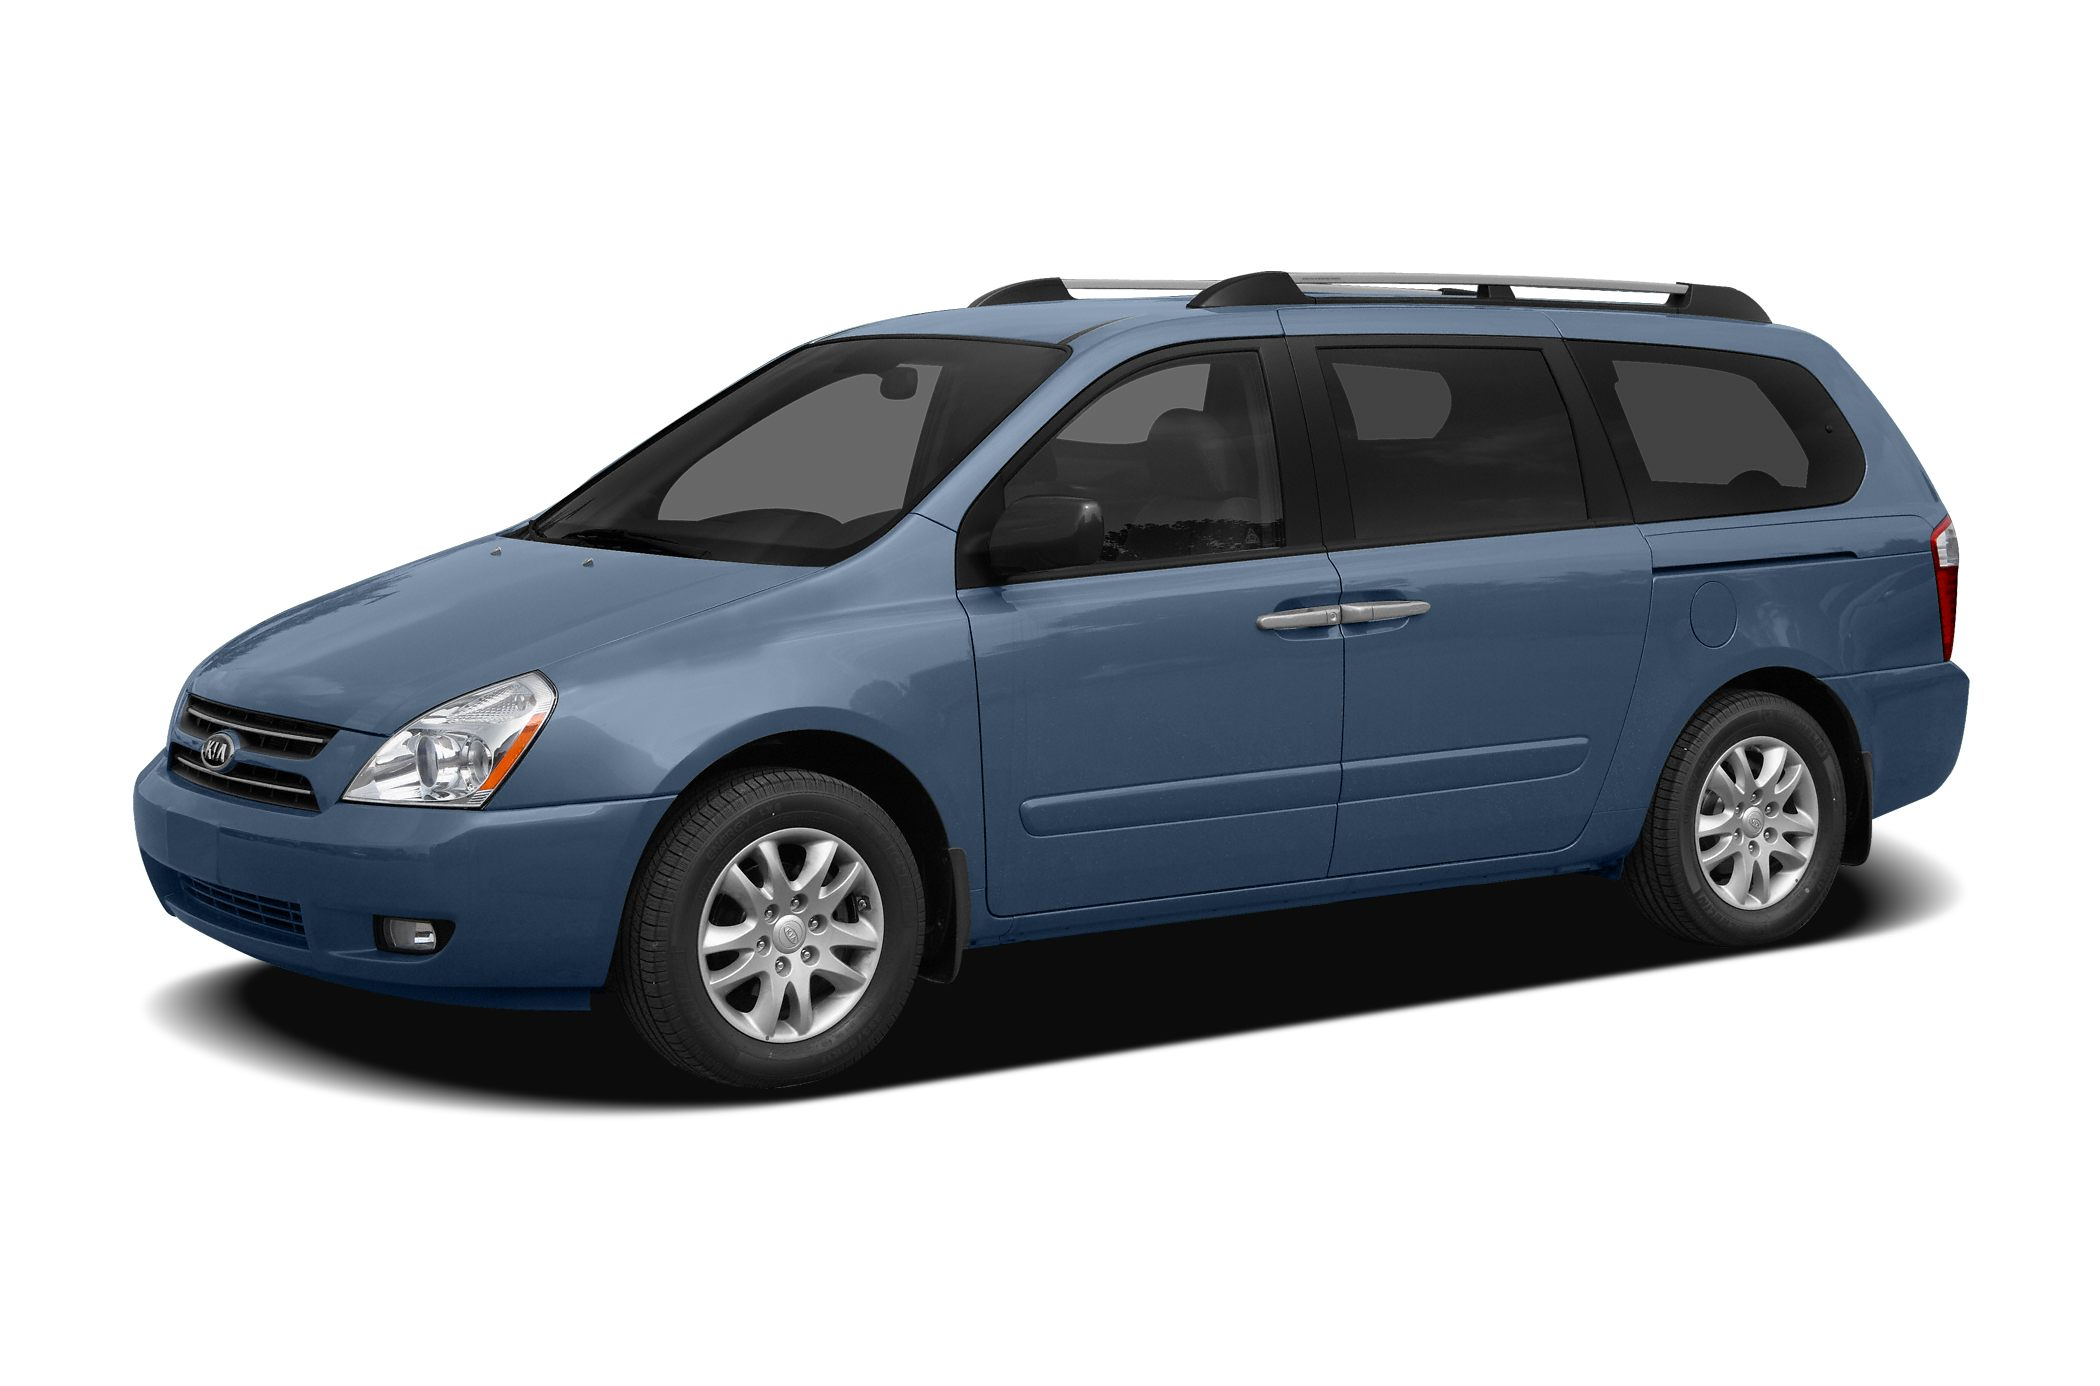 2008 Kia Sedona LX Minivan for sale in Valdosta for $8,694 with 112,998 miles